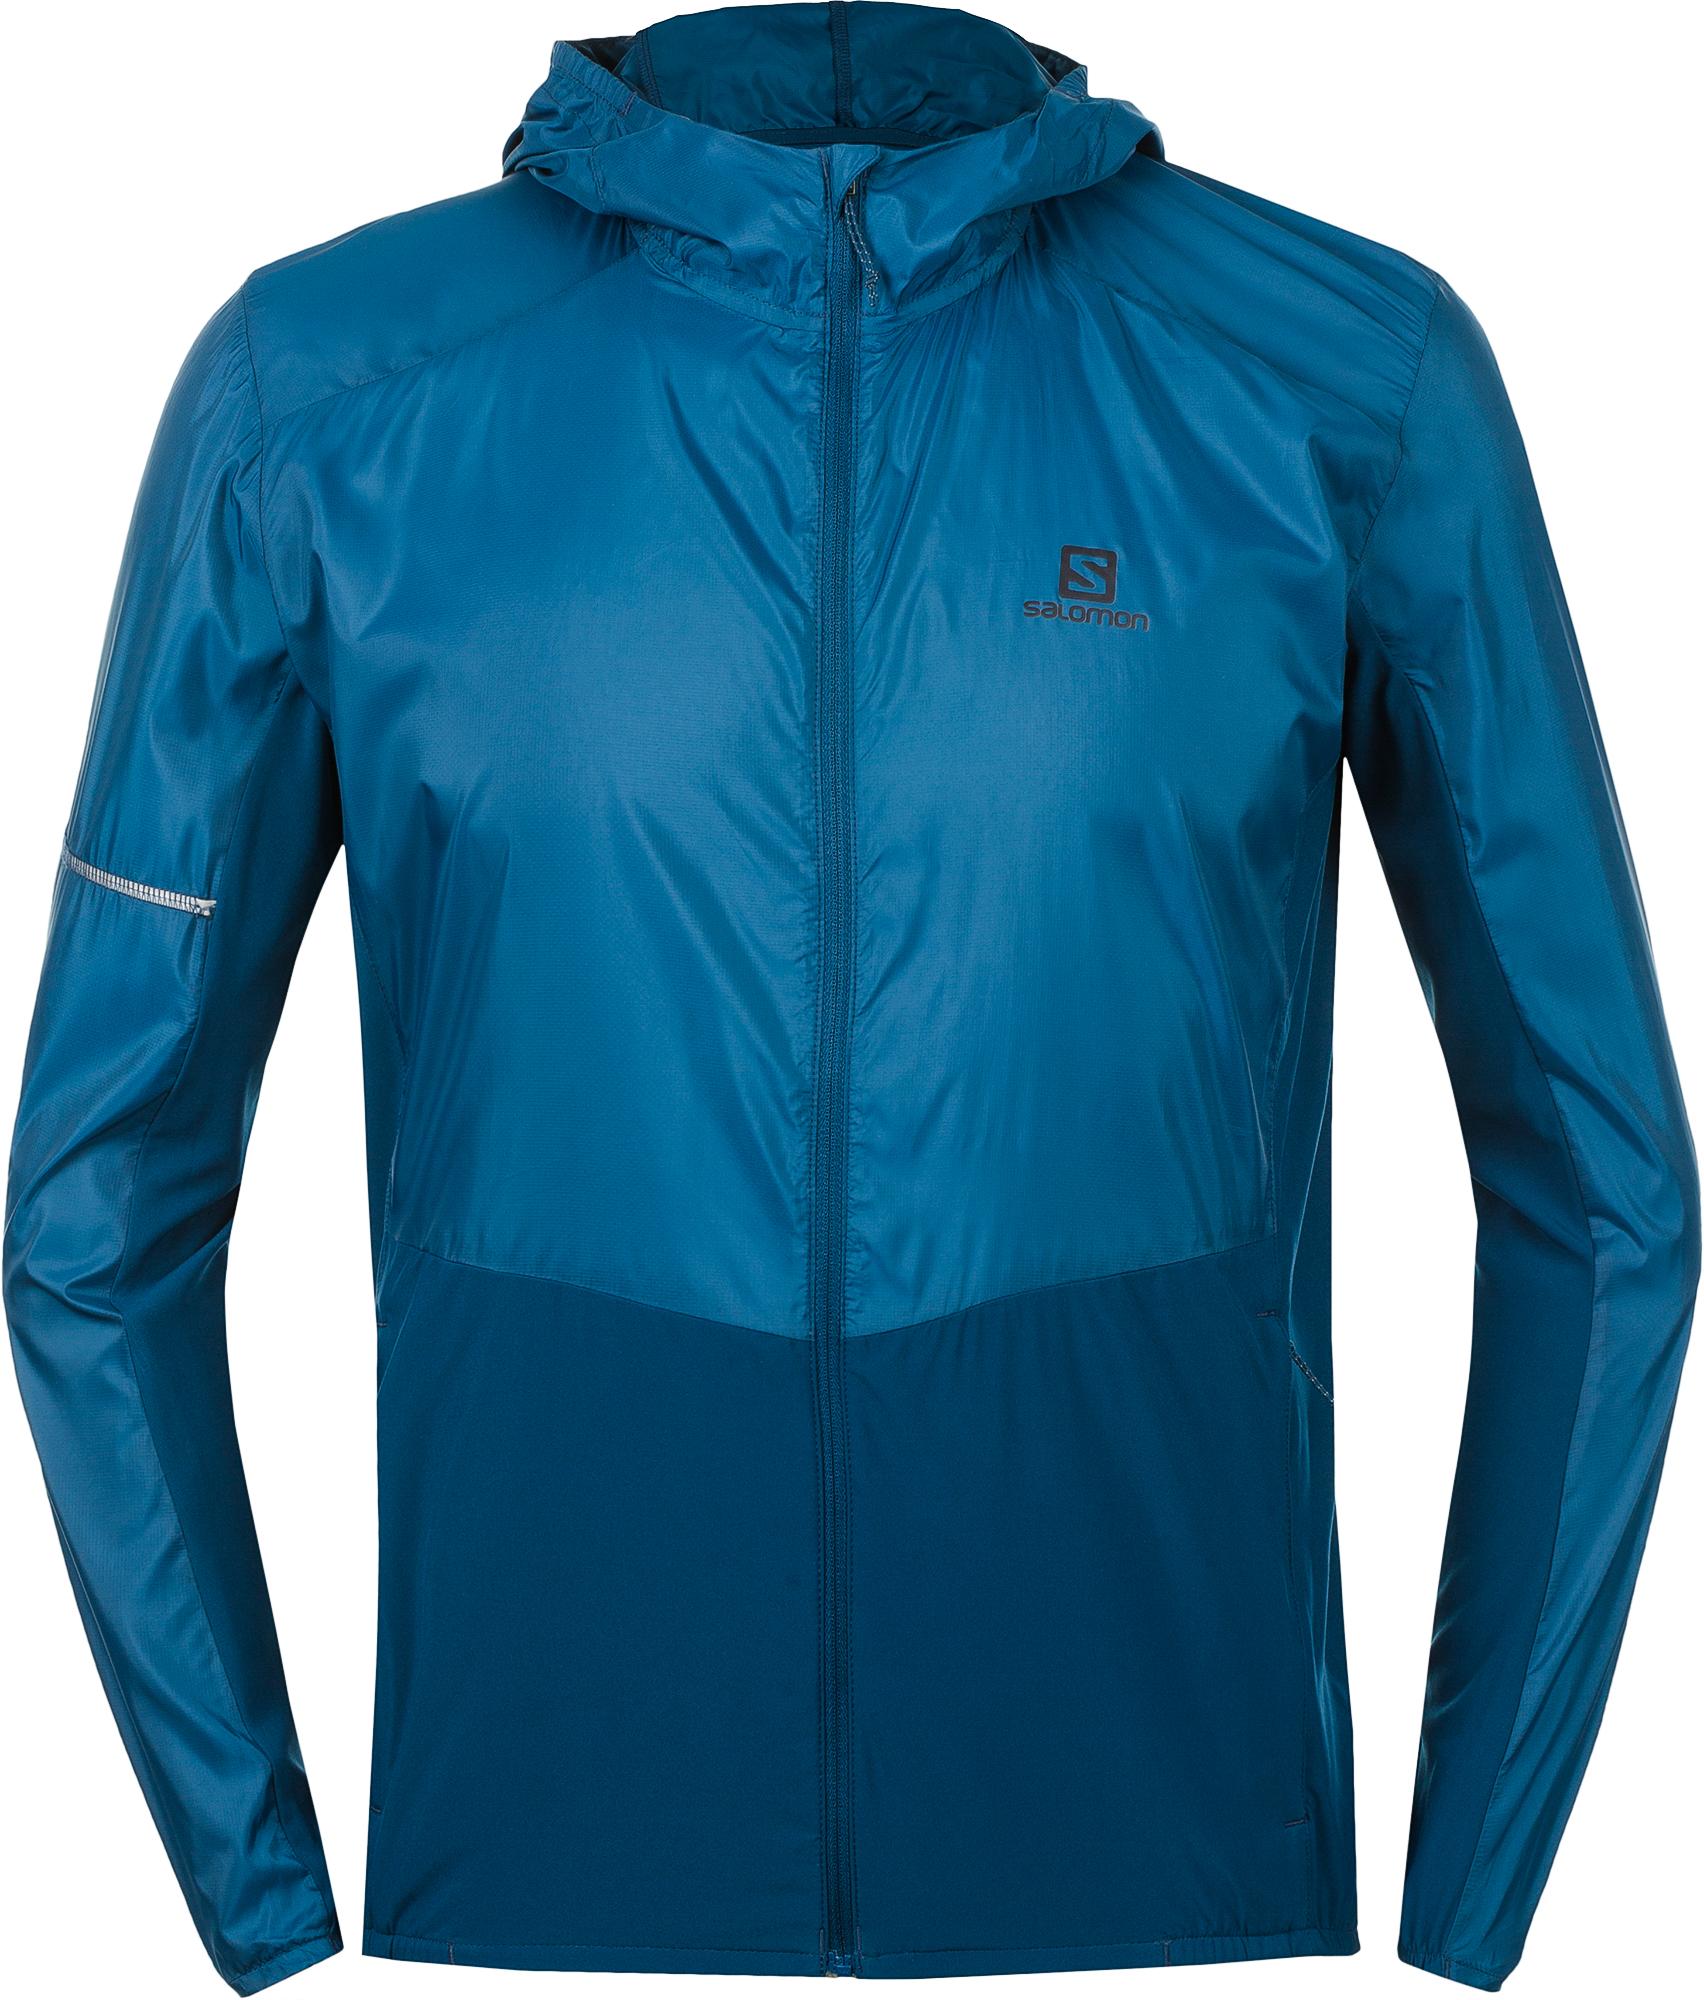 Salomon Куртка мужская Salomon Agile, размер 44-46